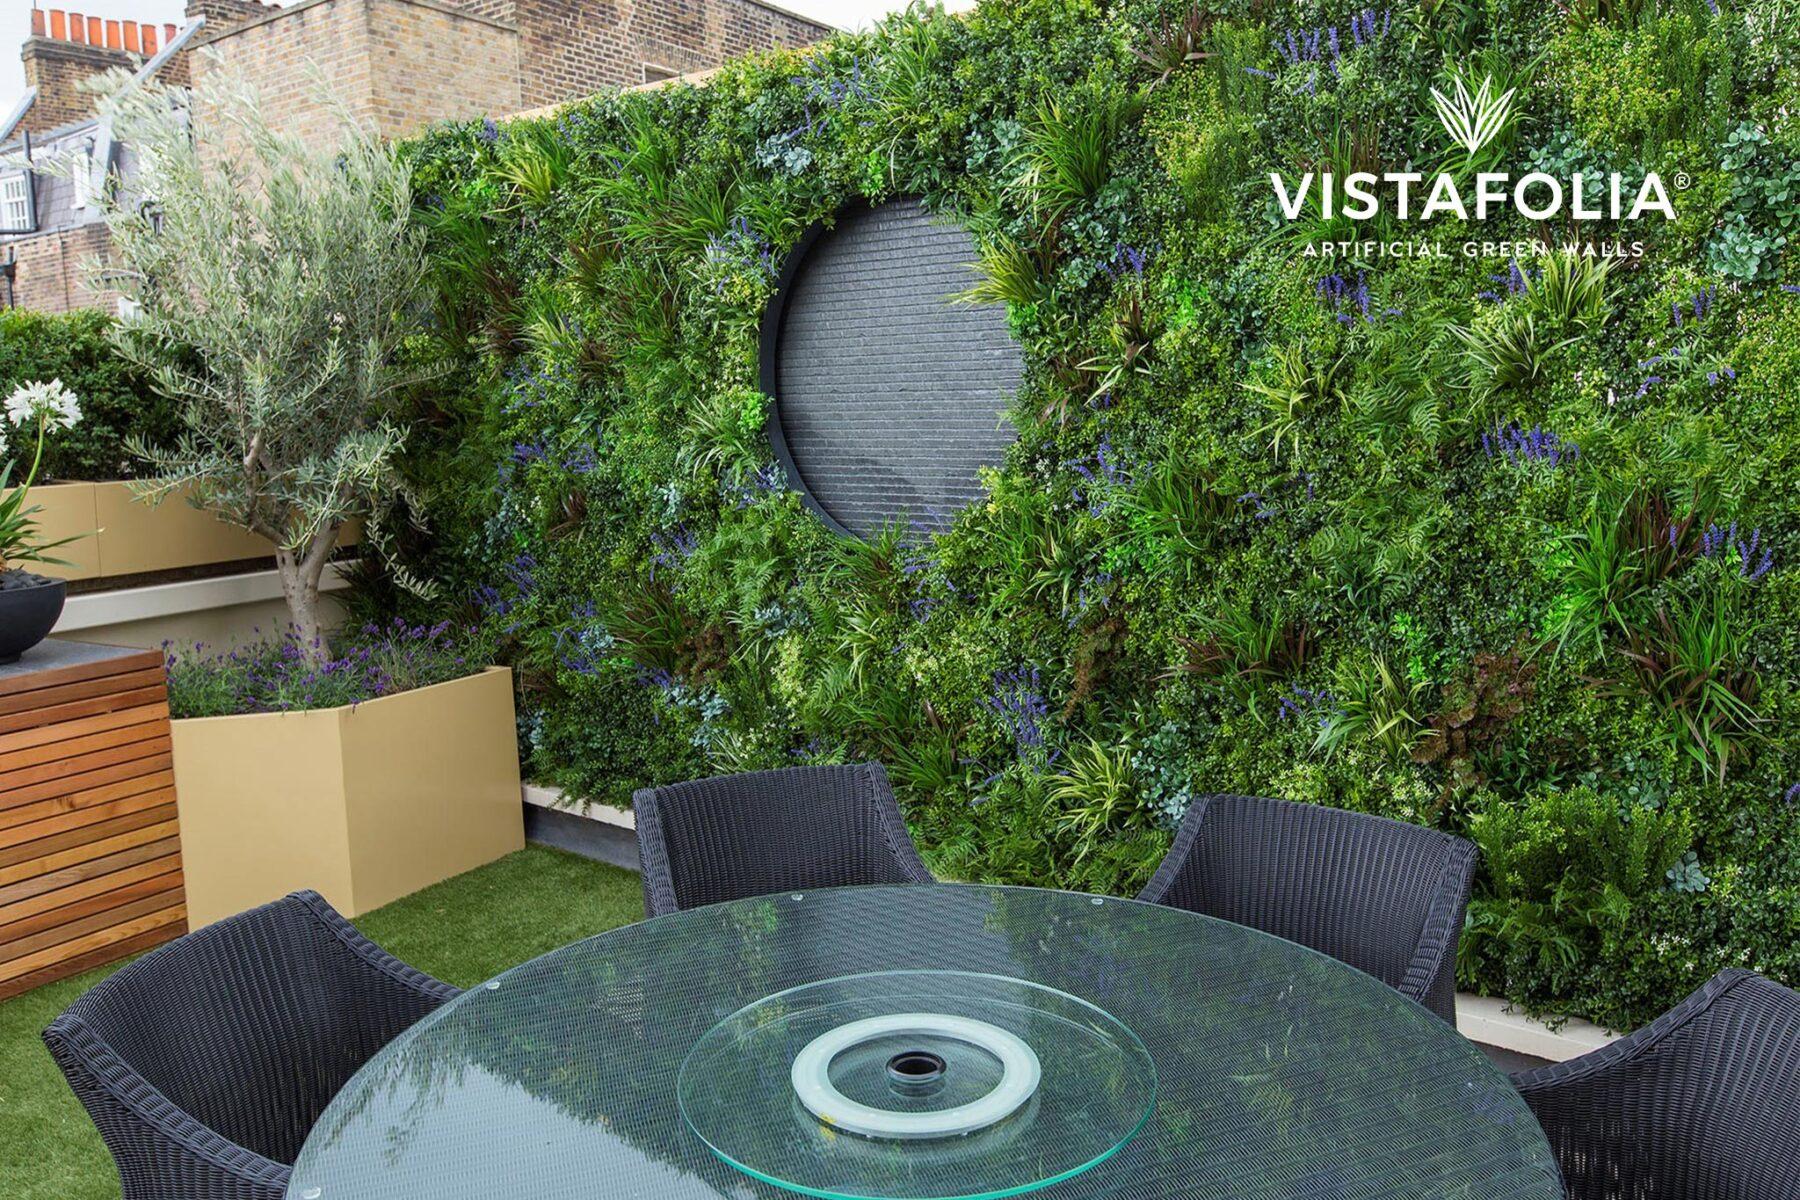 green walls artificial grass installation, vistafolia